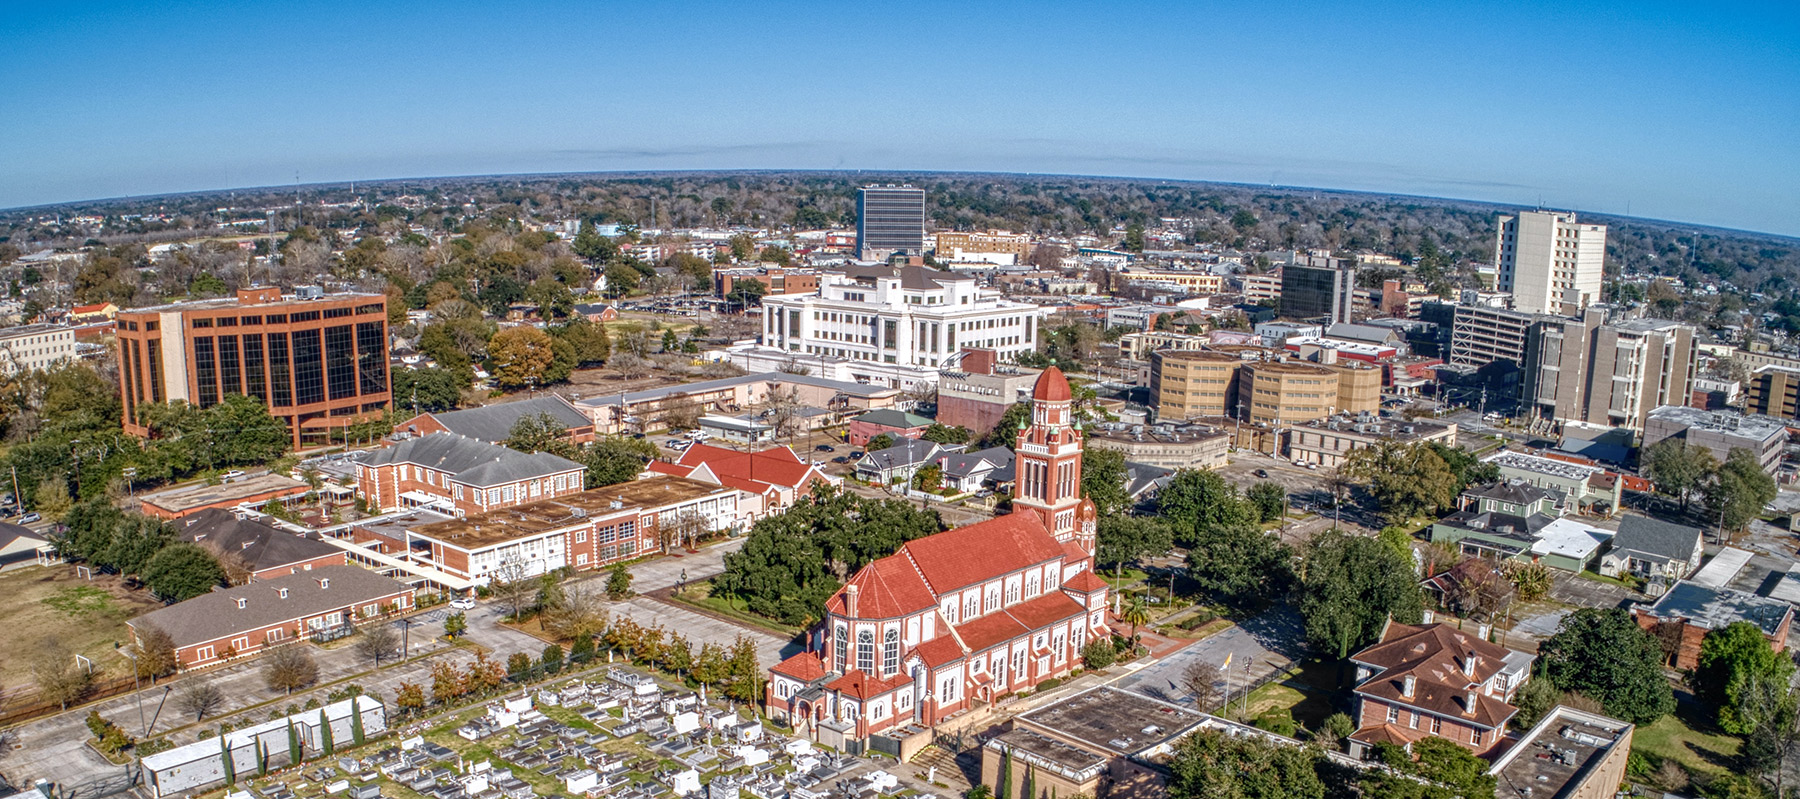 Image of Lafayette, LA